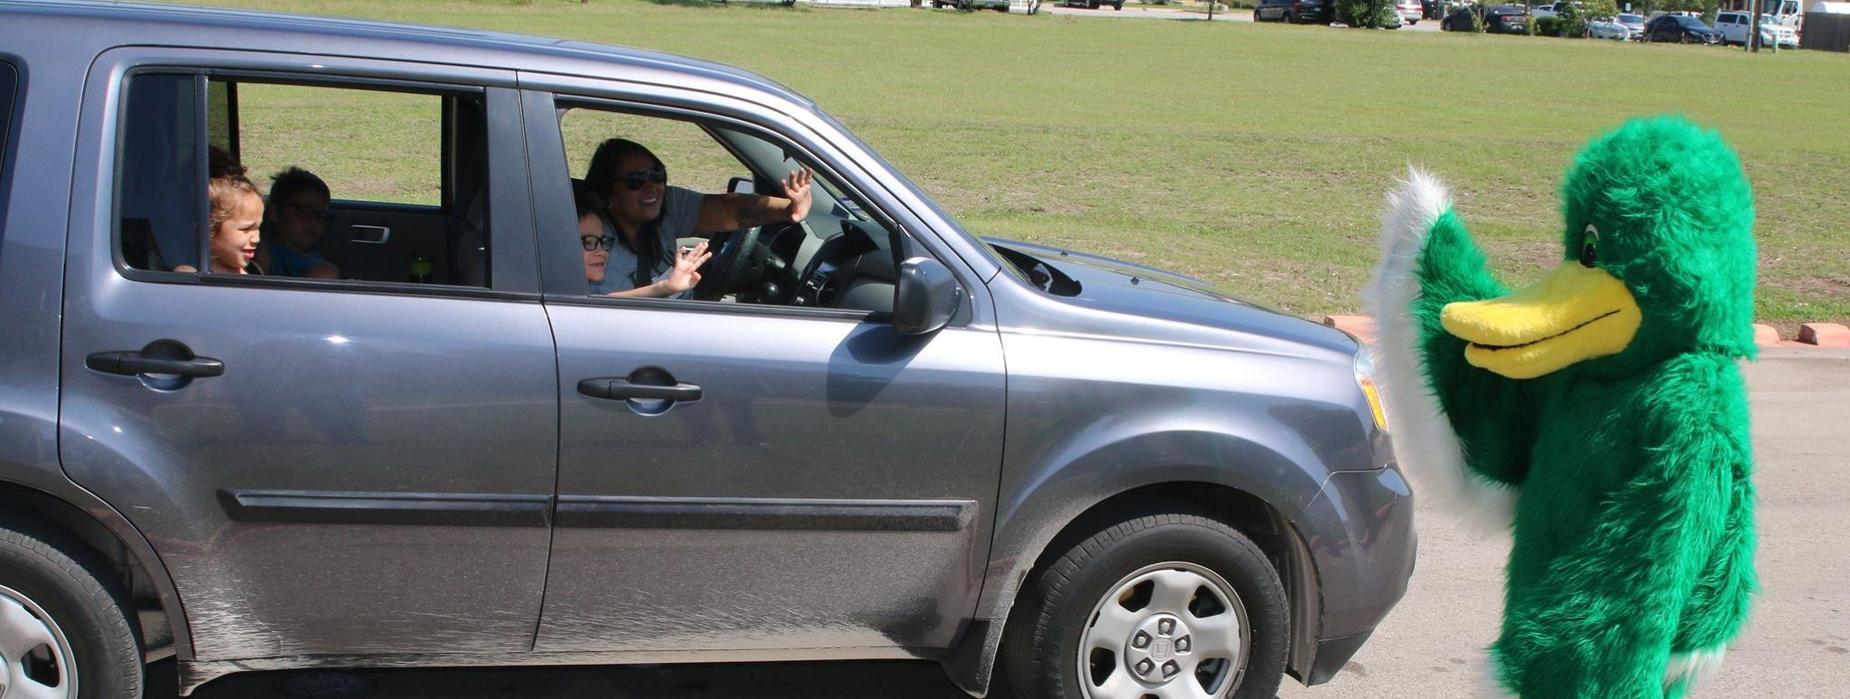 Mascot waving at children in car.